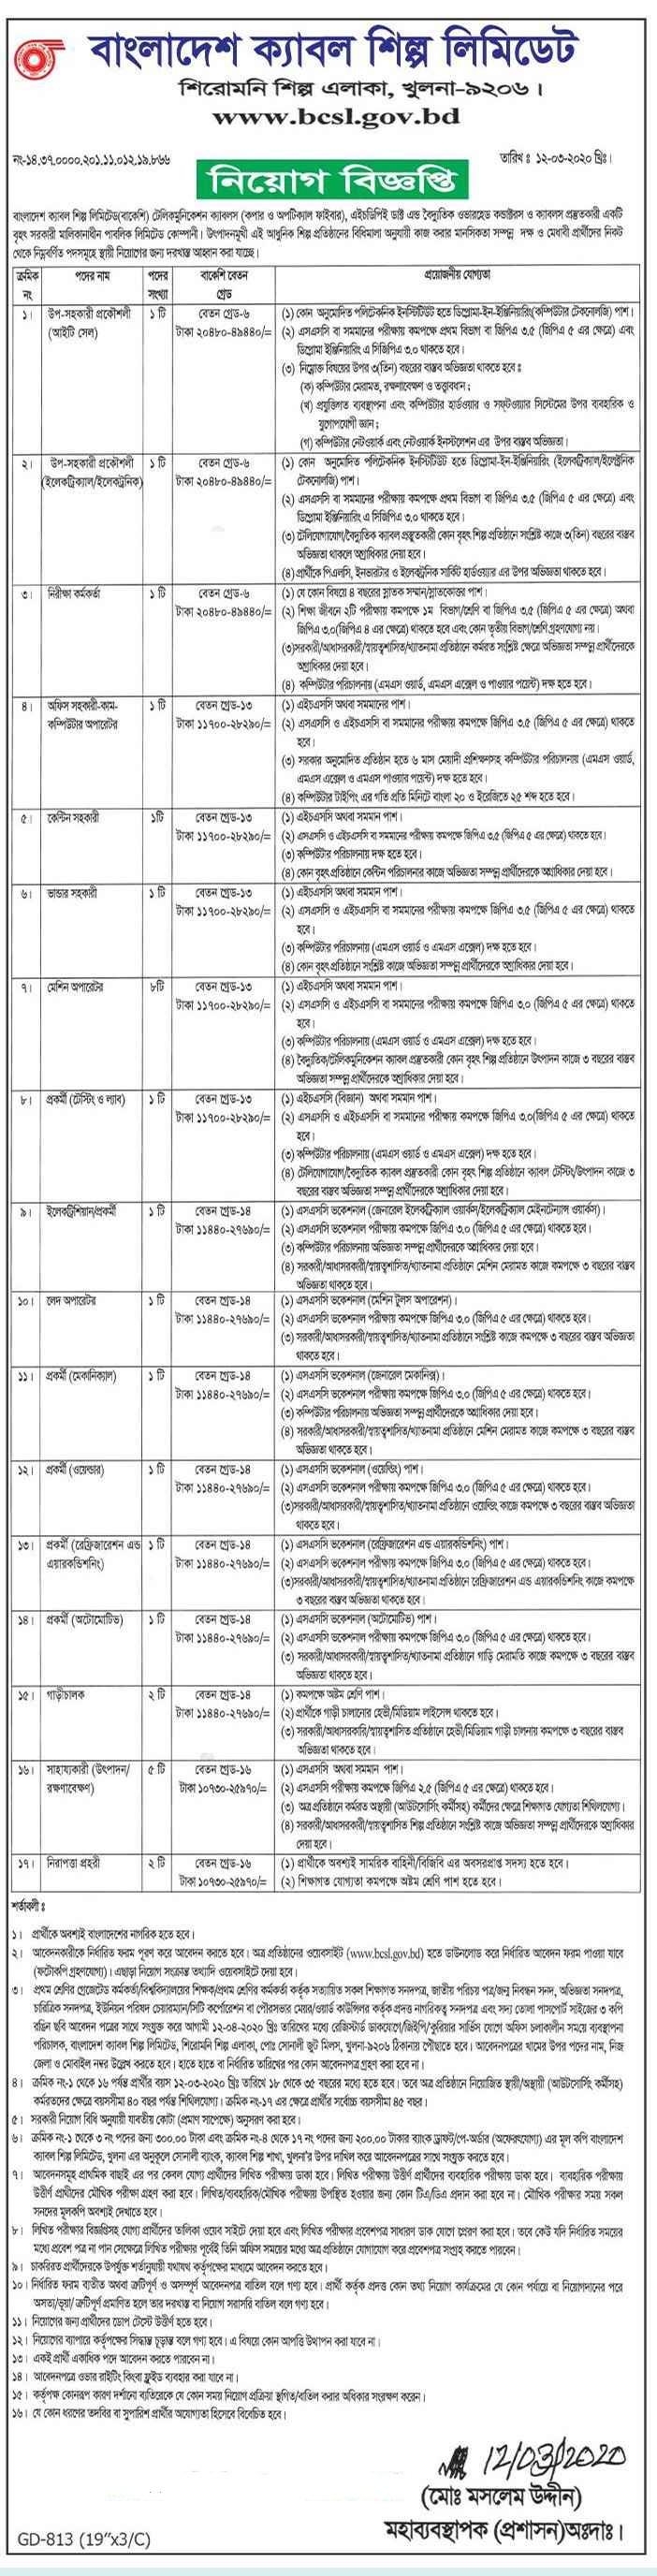 BCSL Job Circular 2020 - bcsl.gov.bd